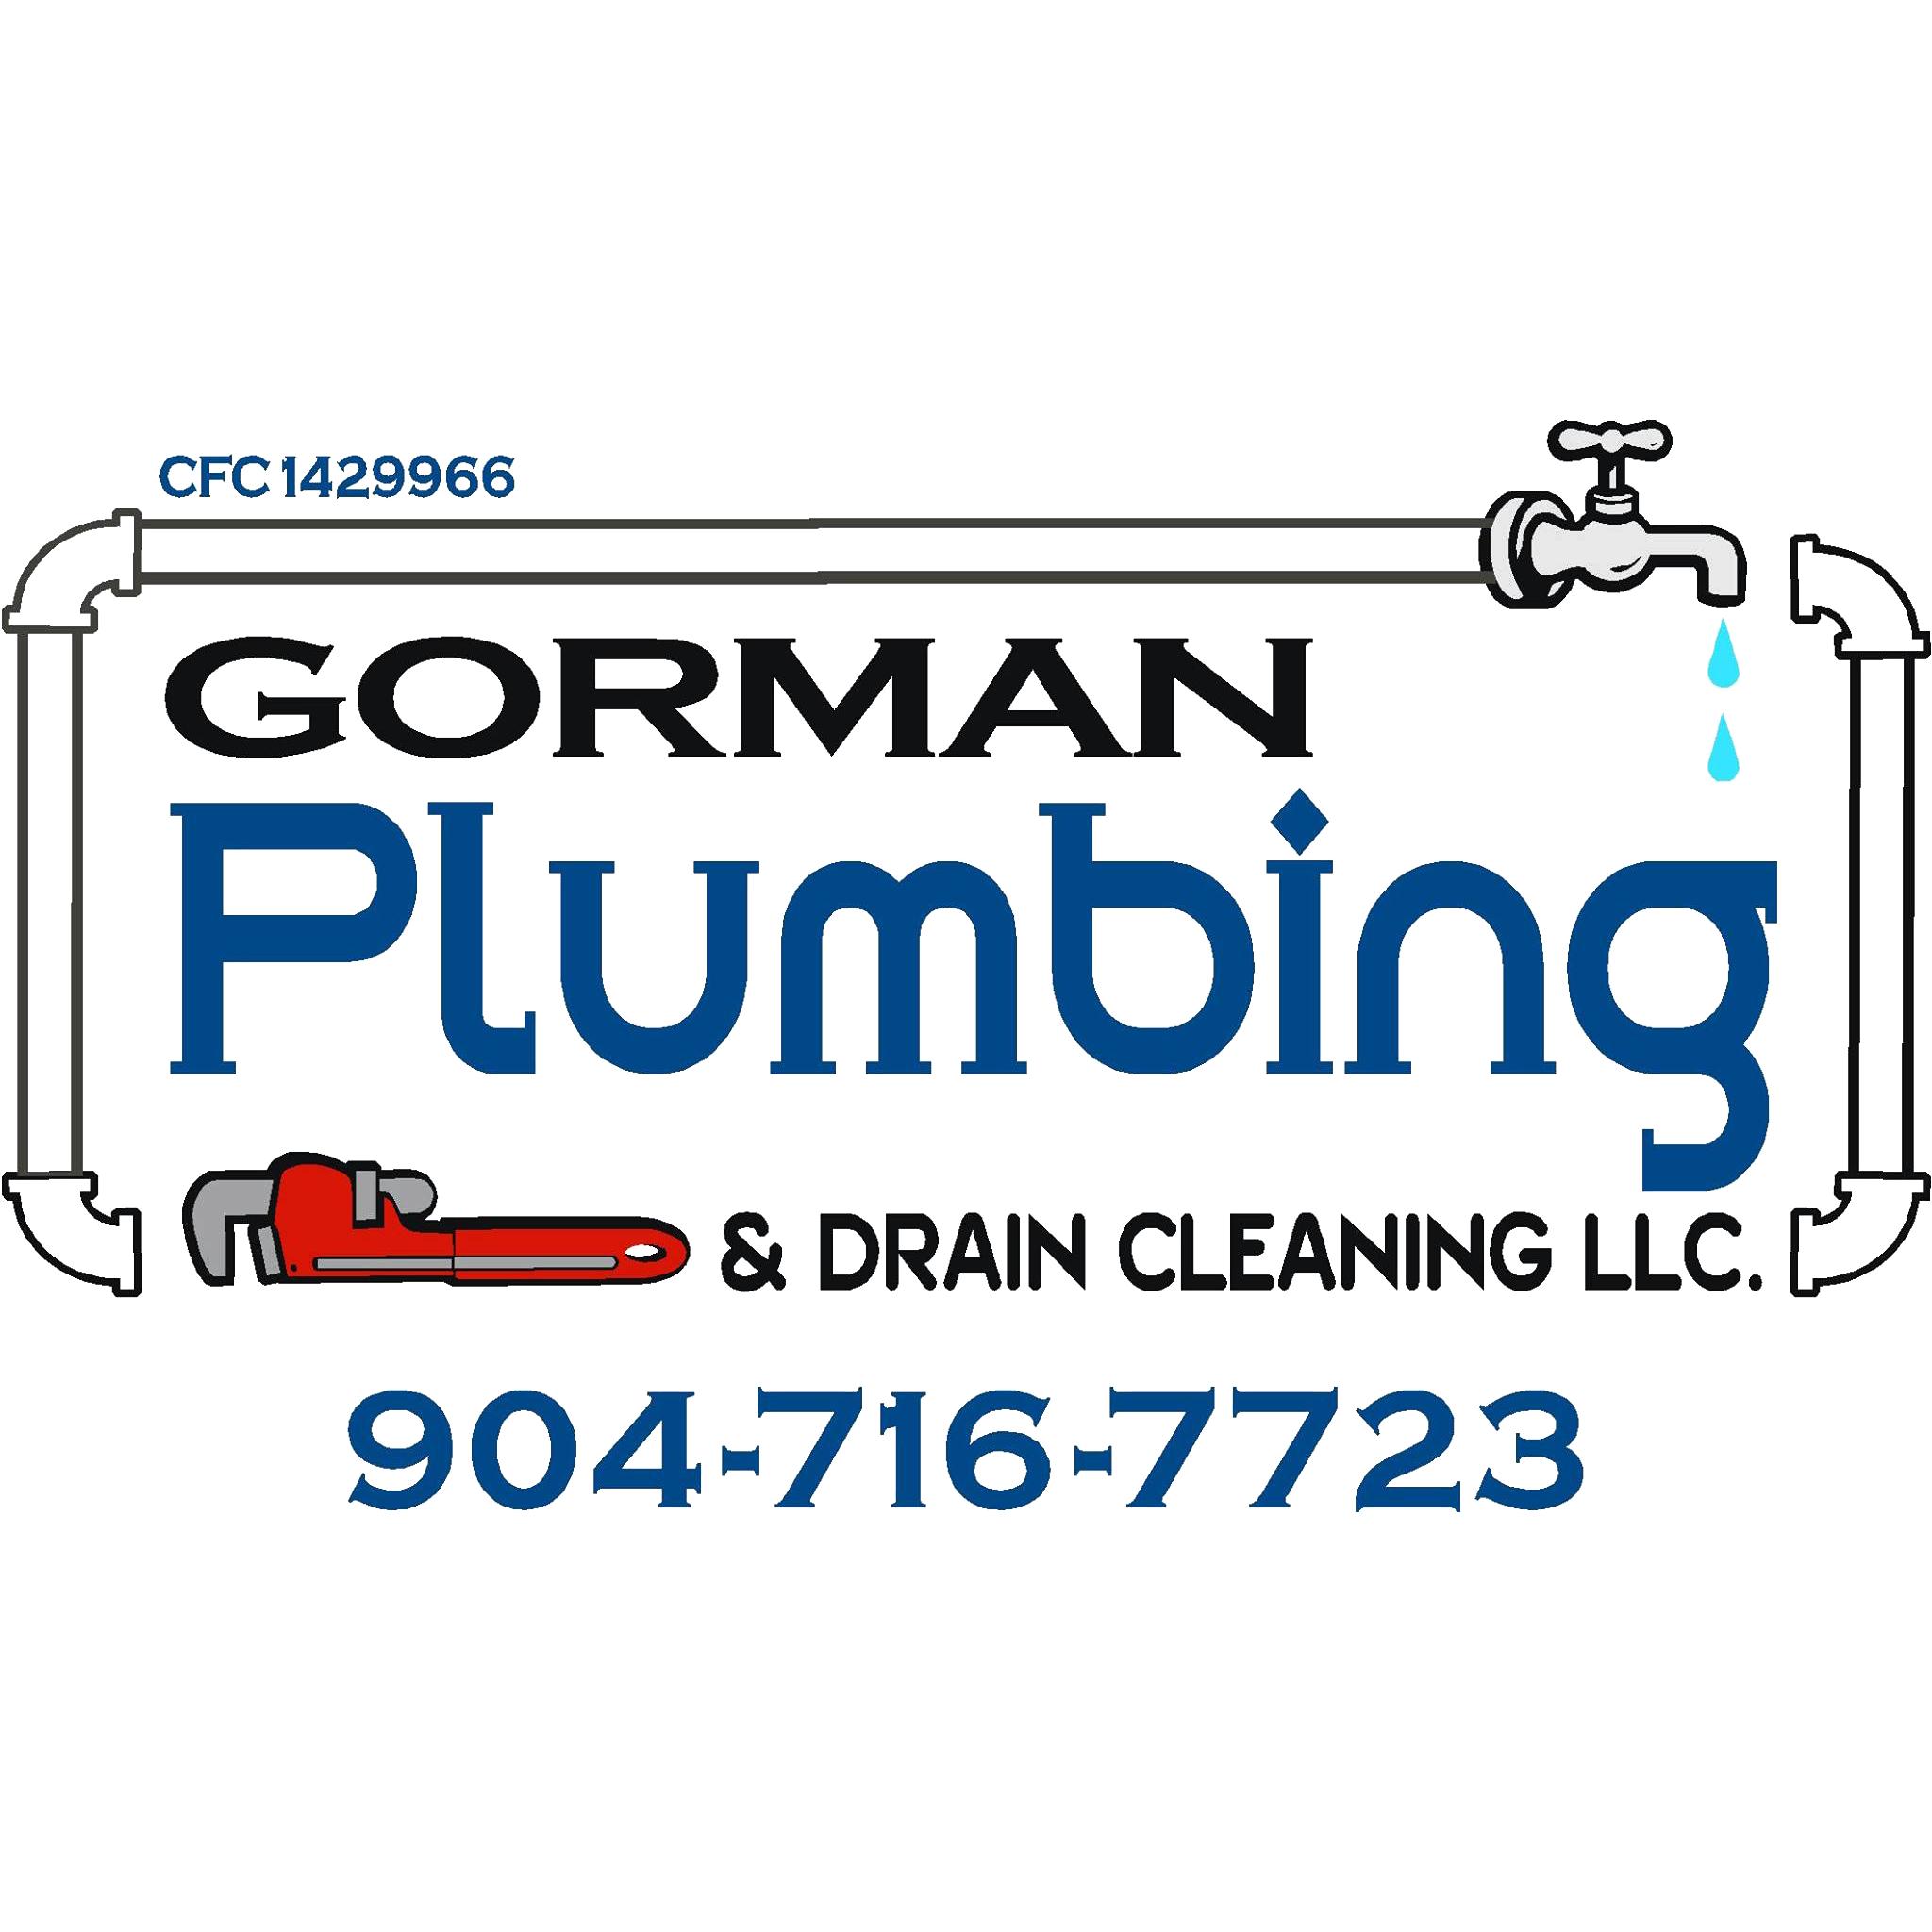 Gorman Plumbing & Drain Cleaning, LLC